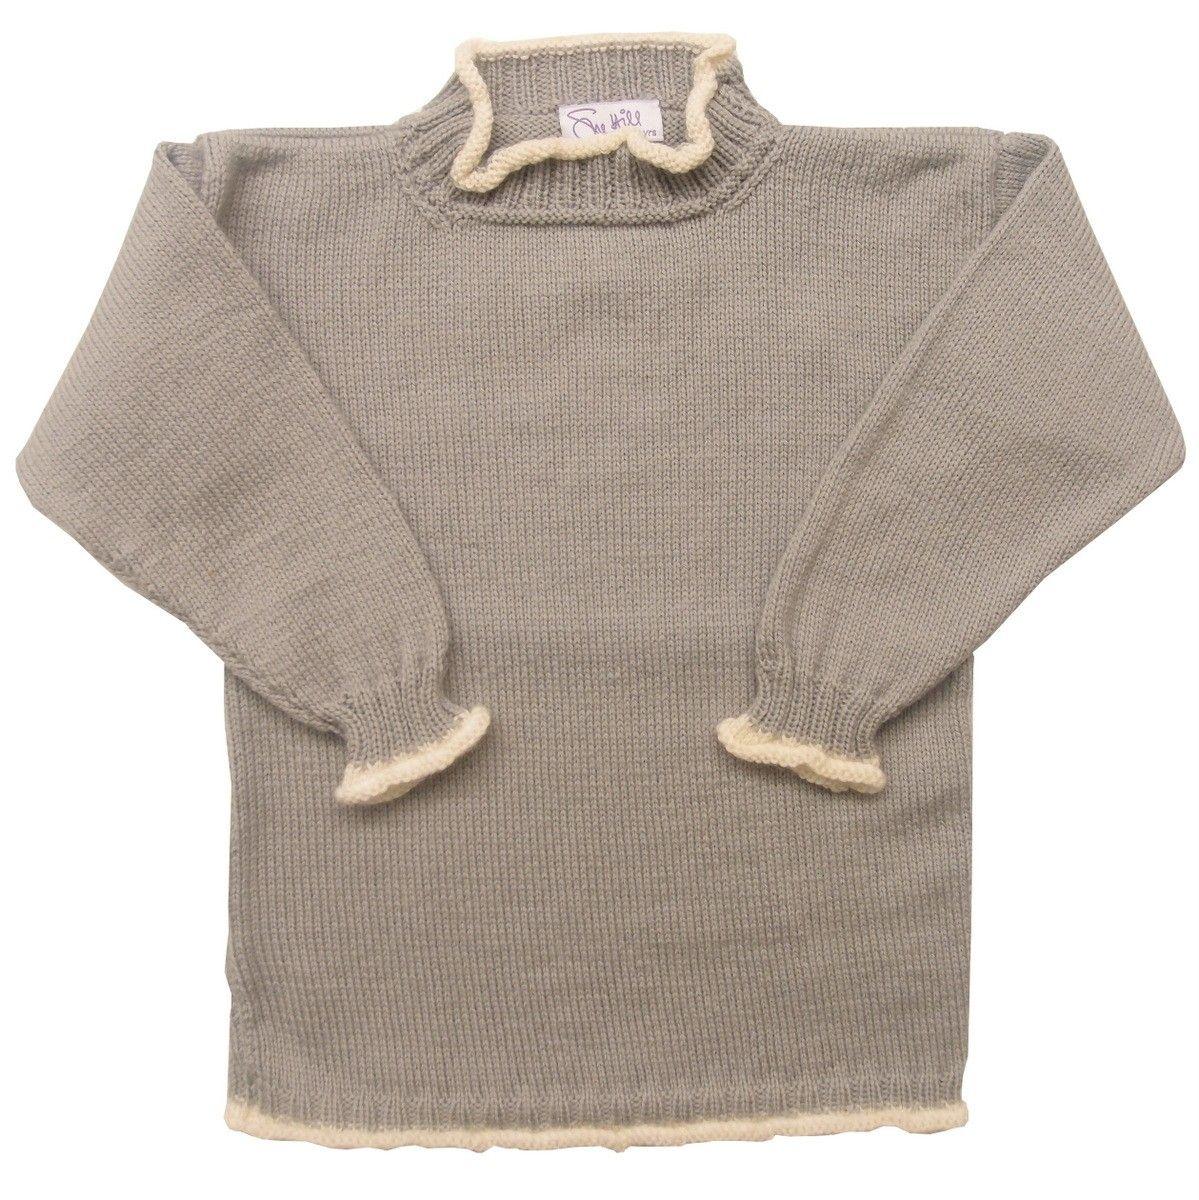 53426b0b5 Pin by Sue Hill on Autumn Winter 2016 - Childrenswear